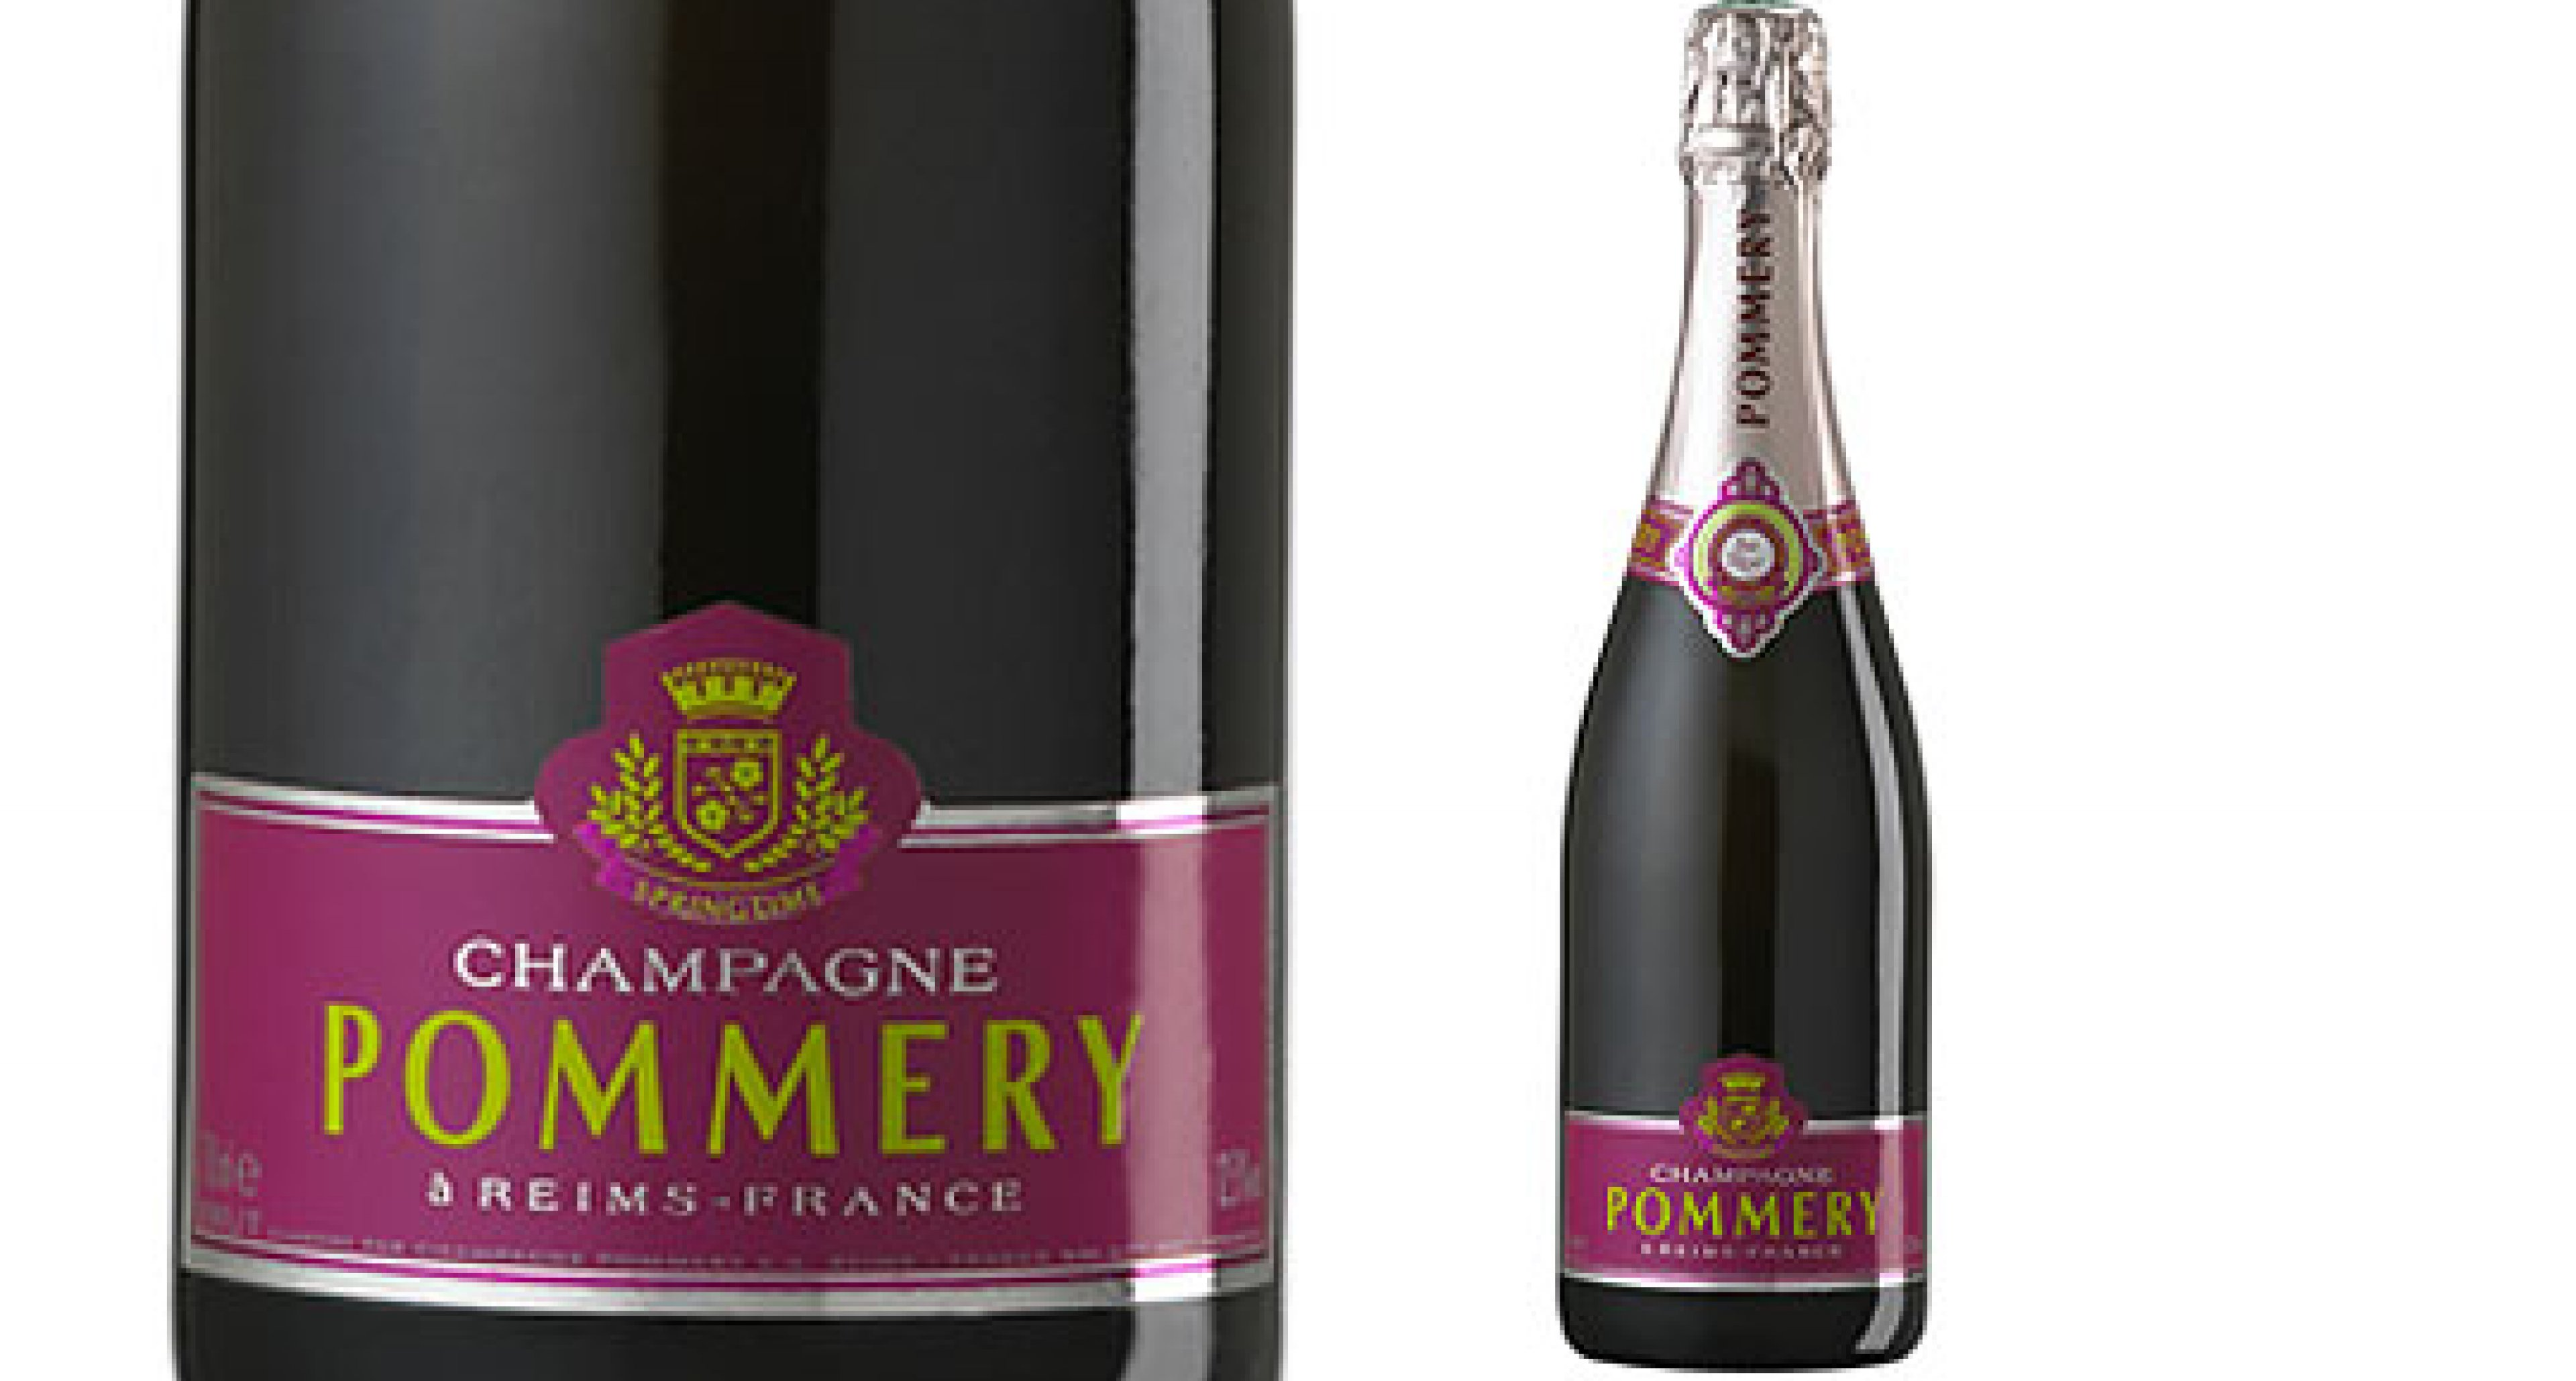 Champagne Pommery Springtime: Pure Lebensfreude